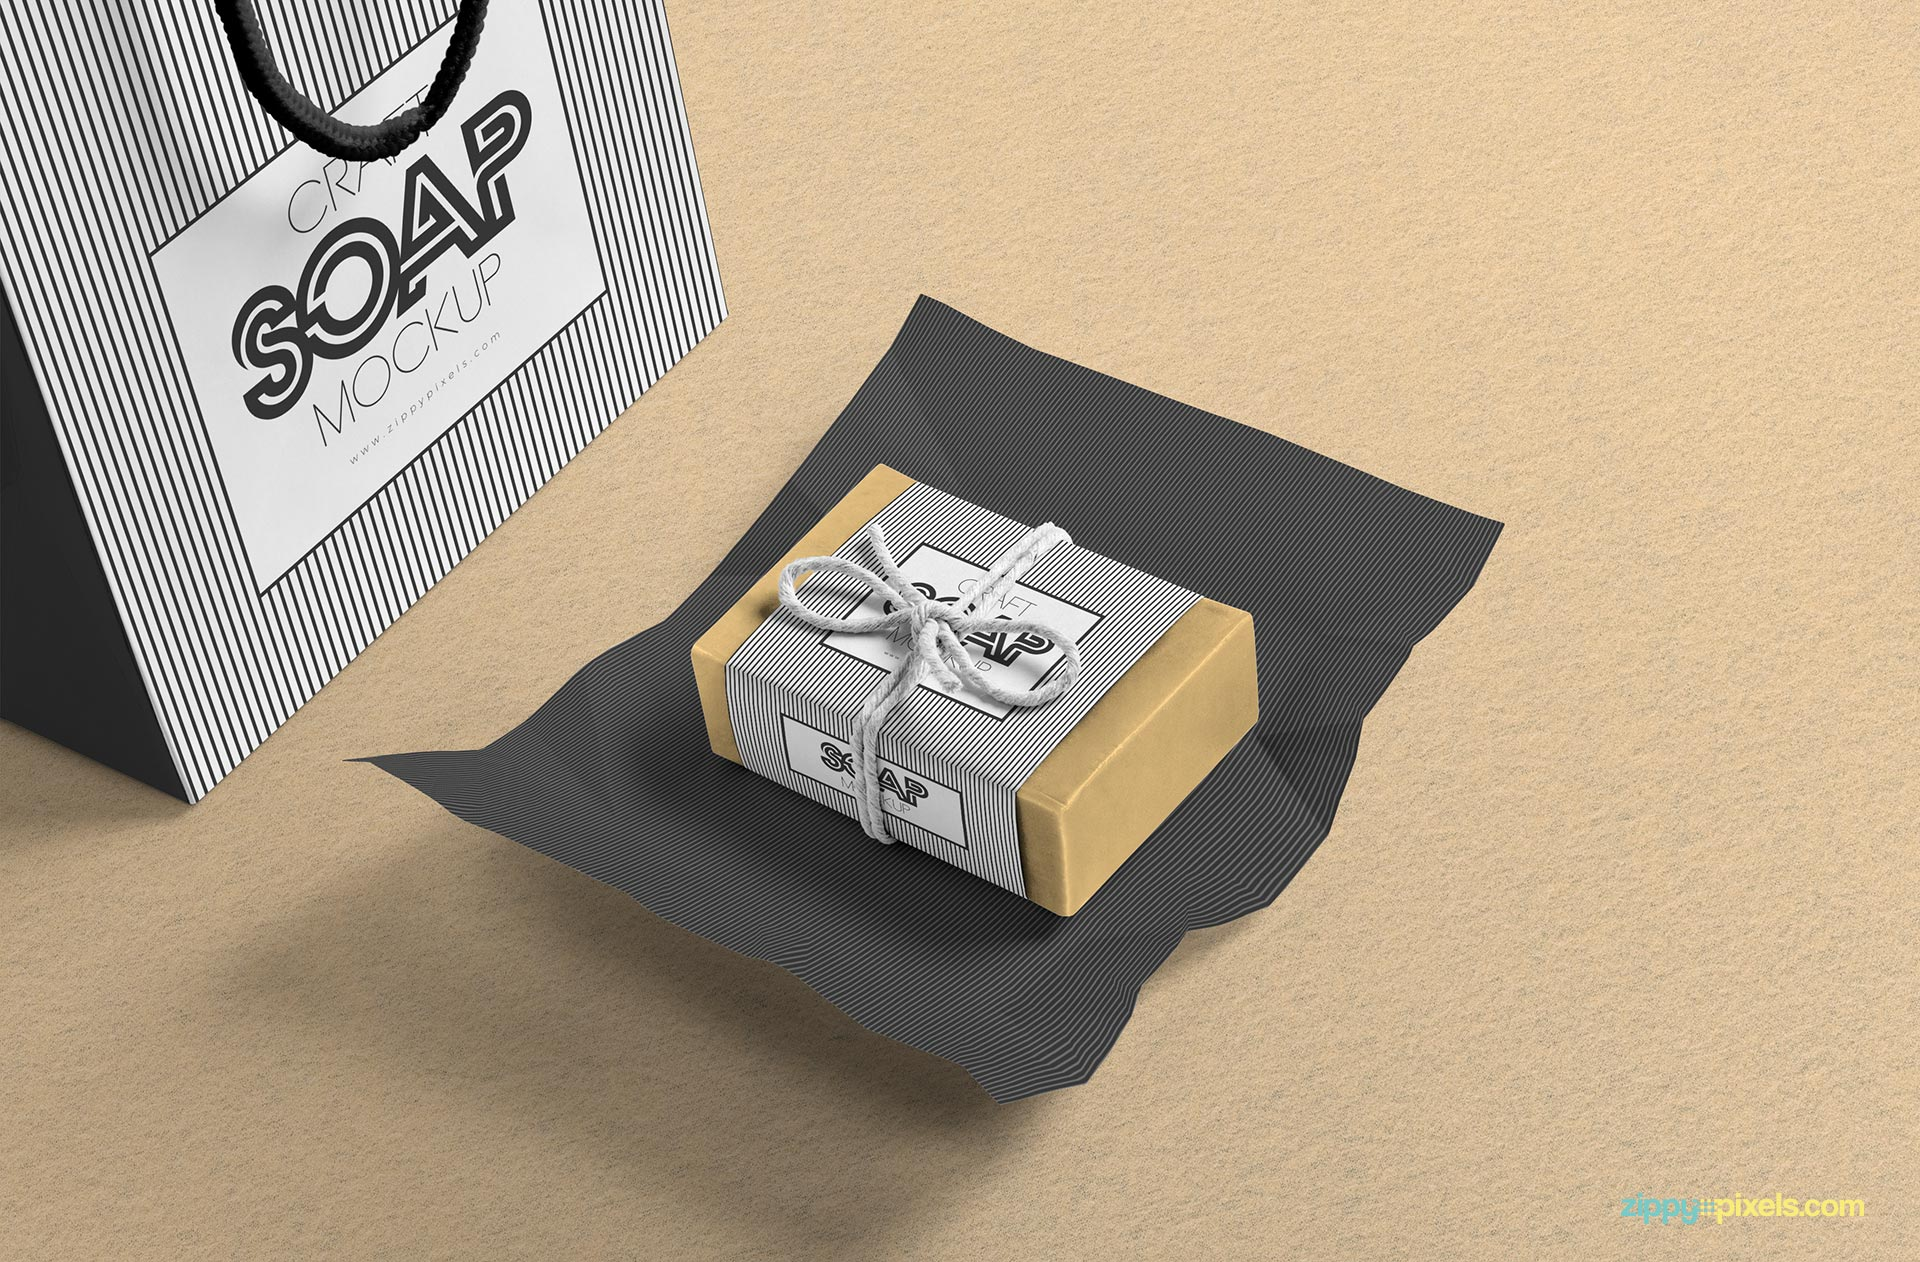 Free craft soap bar mockup.